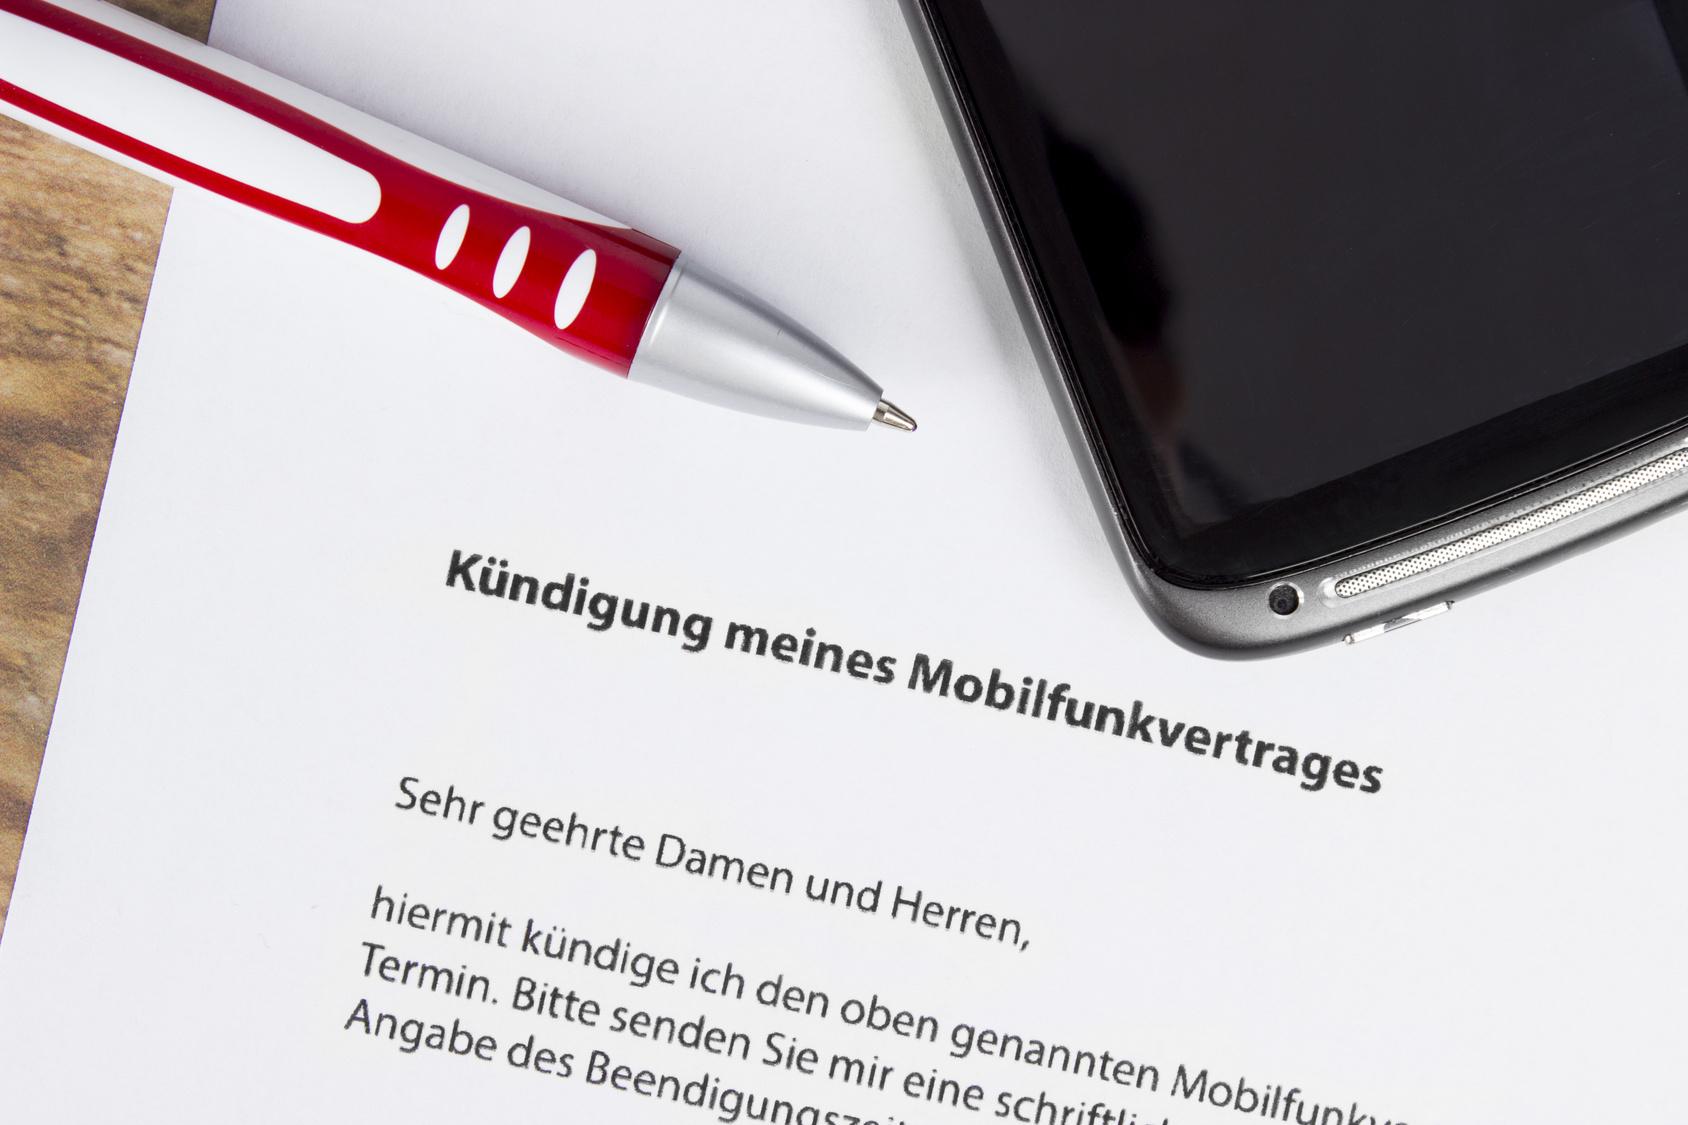 Vodafone Kündigung